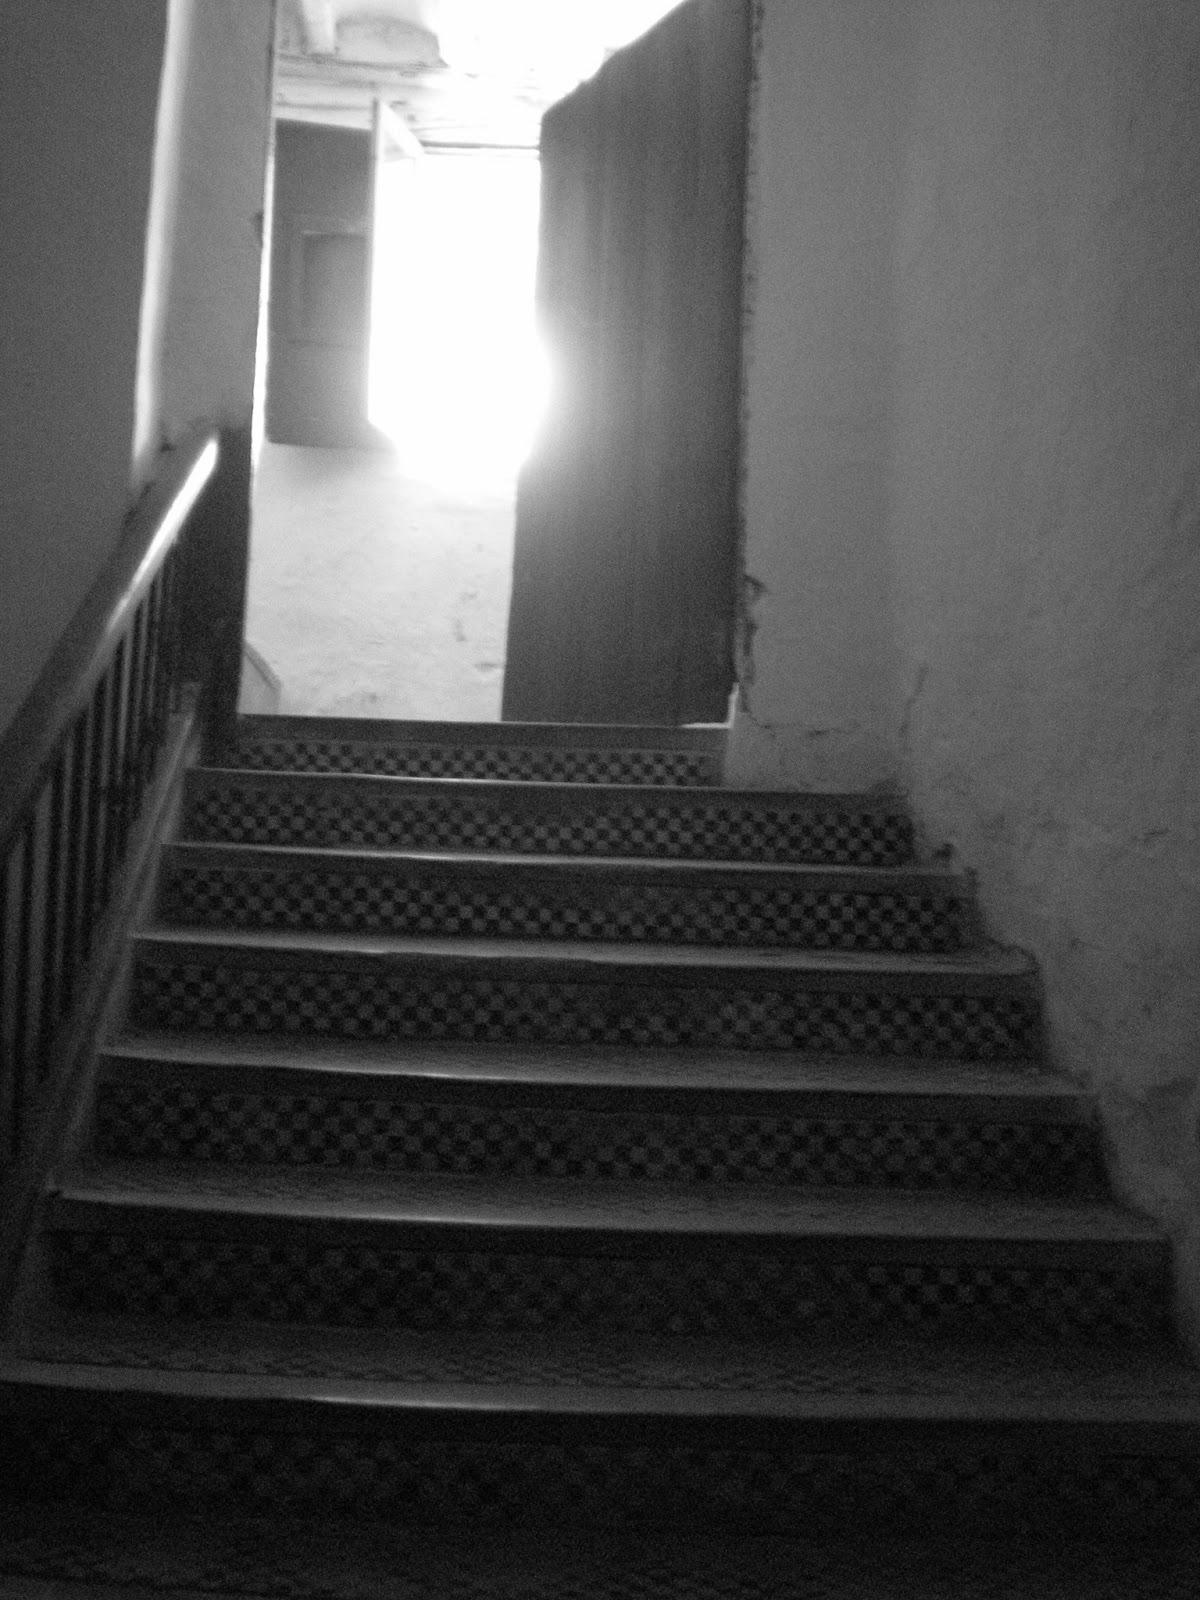 Escalera palacio típico aragonés siglo XVII